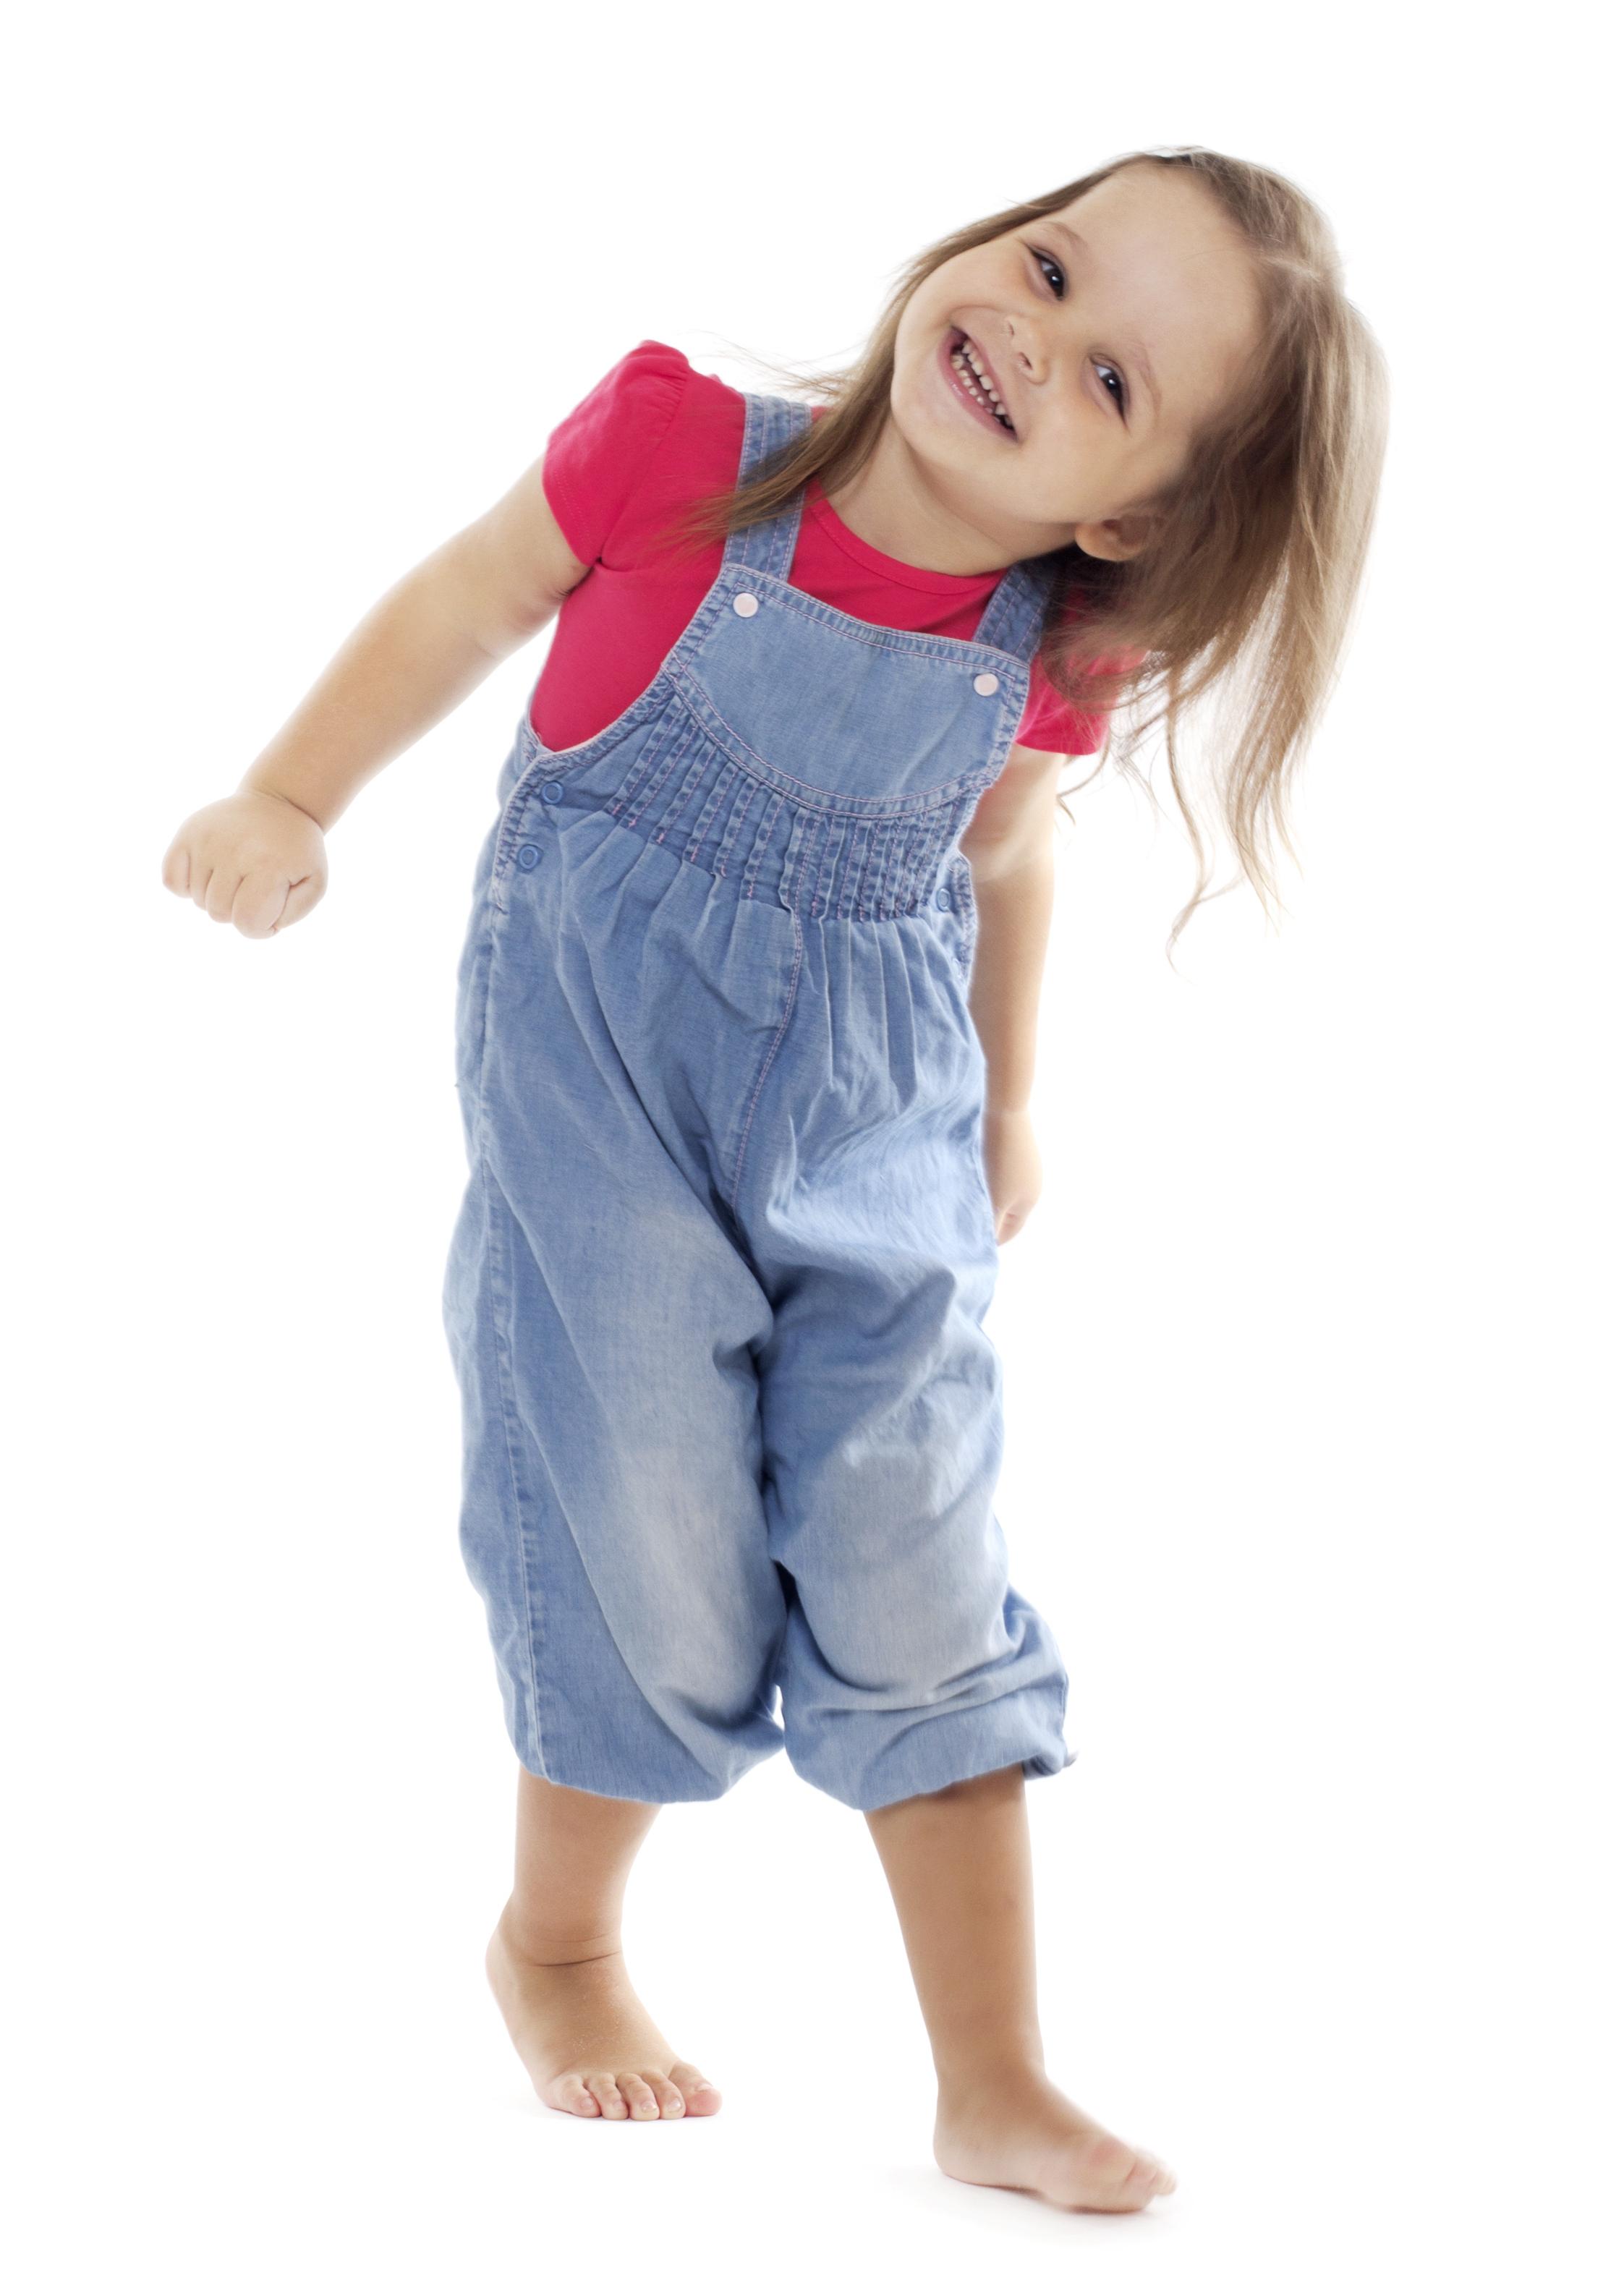 Toddler dancing.